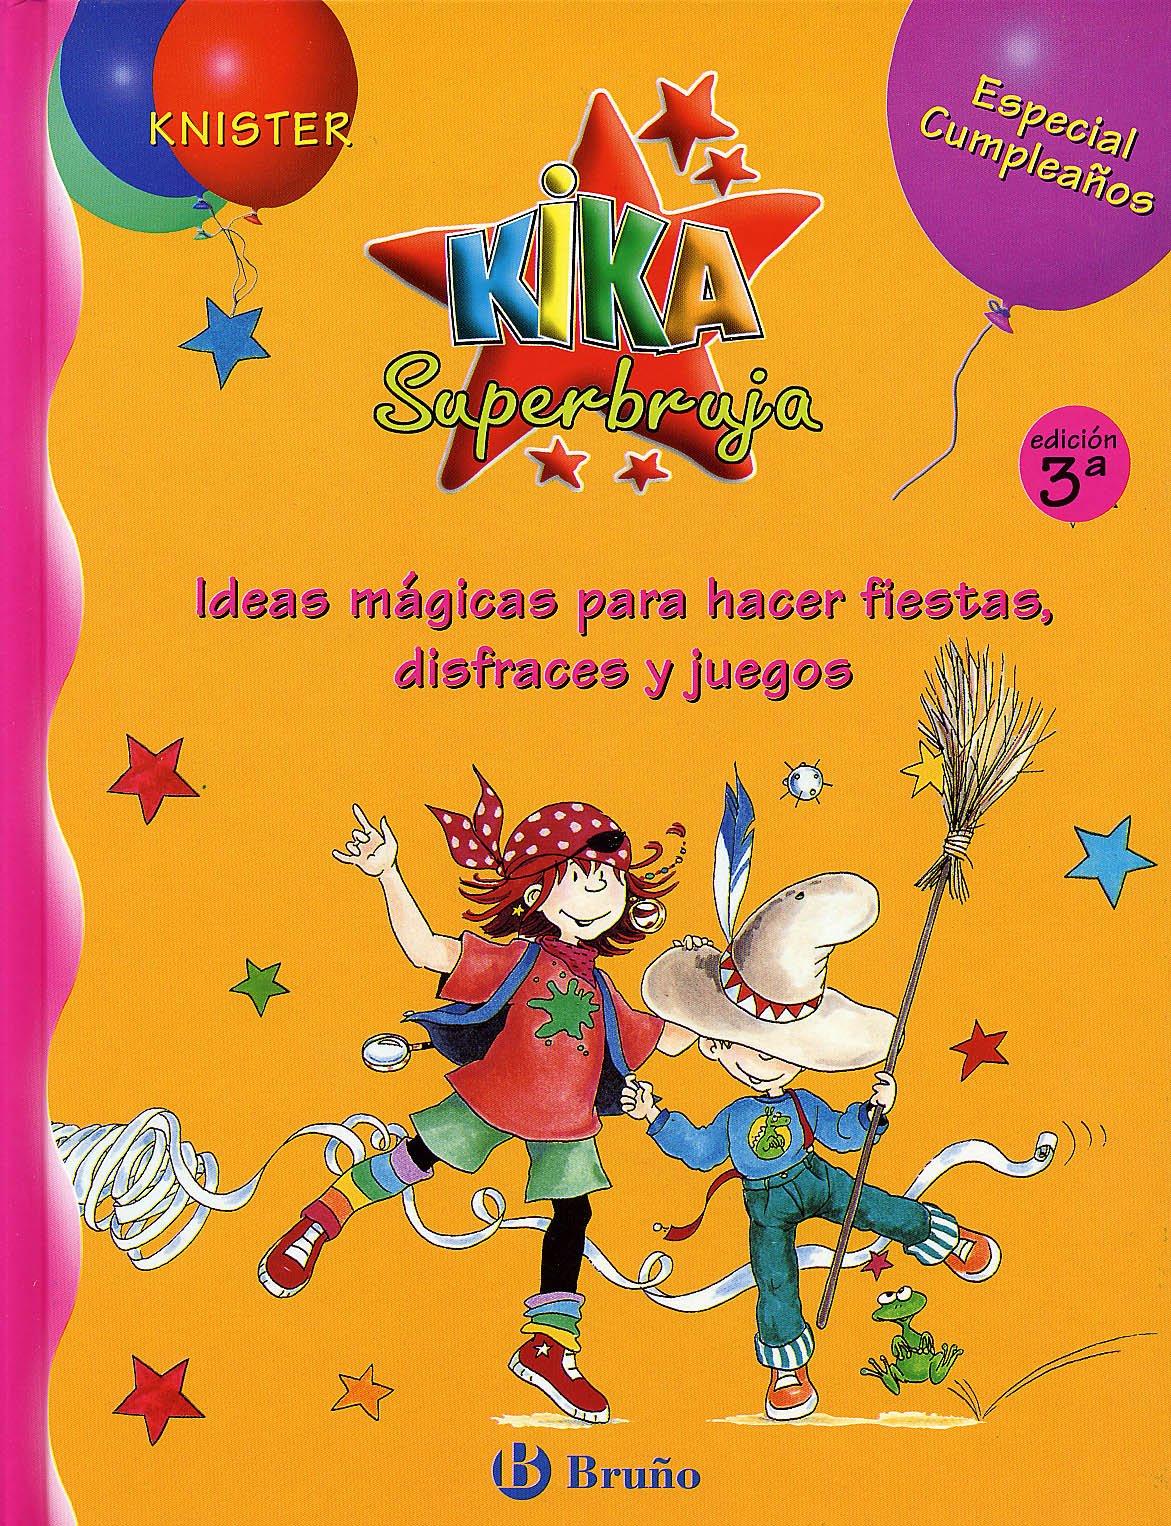 Kika superbruja - especial cumpleaños Especiales Kika bruño ...